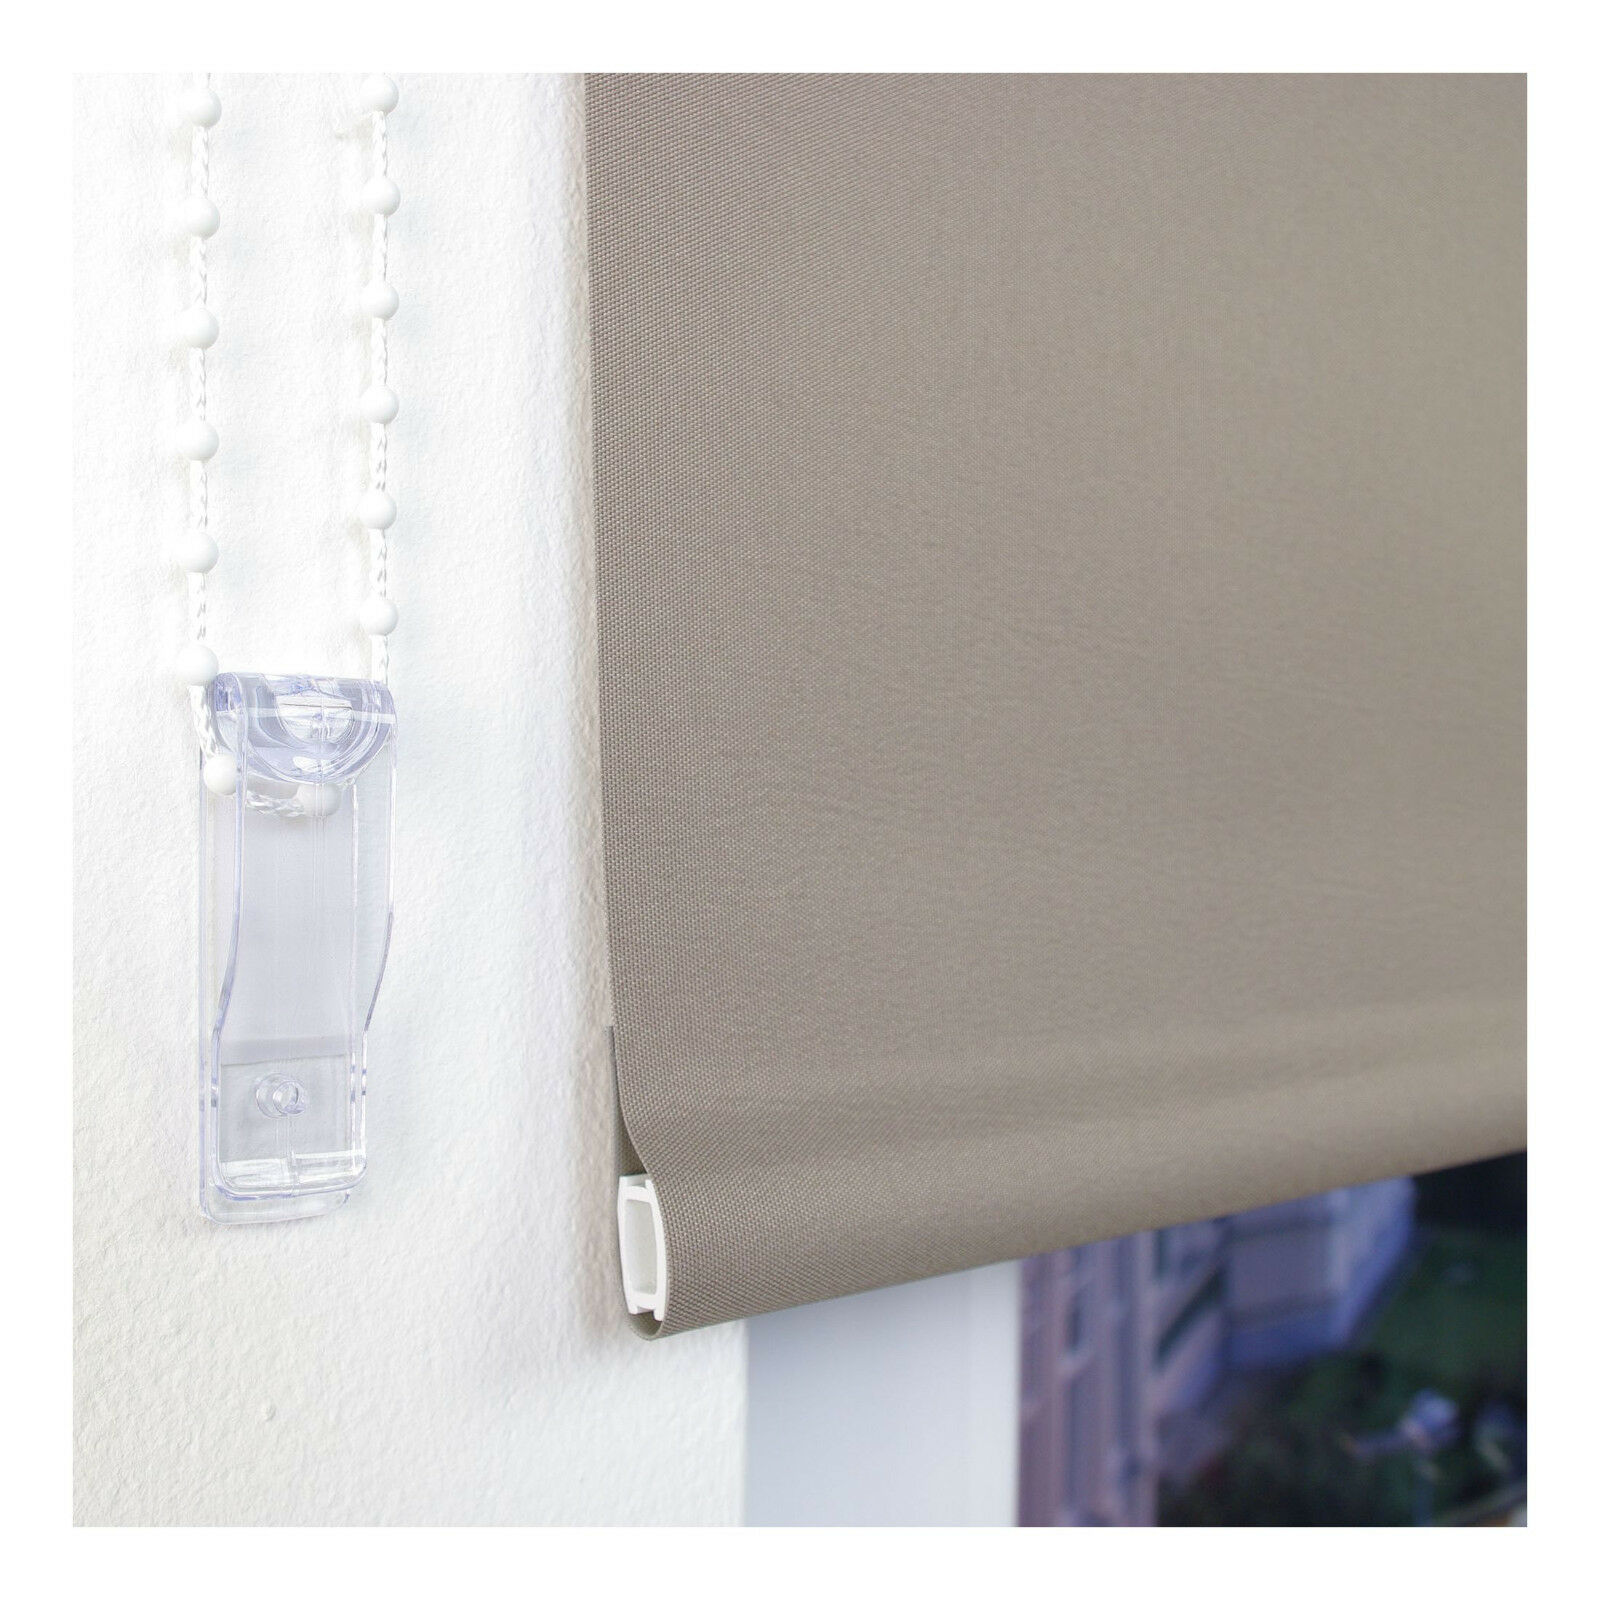 Verdunklungsrollo Caffee Ketten- Seitenzugrollo Fensterrollo Fensterrollo Fensterrollo Sichtschutz Tür fe8cf6